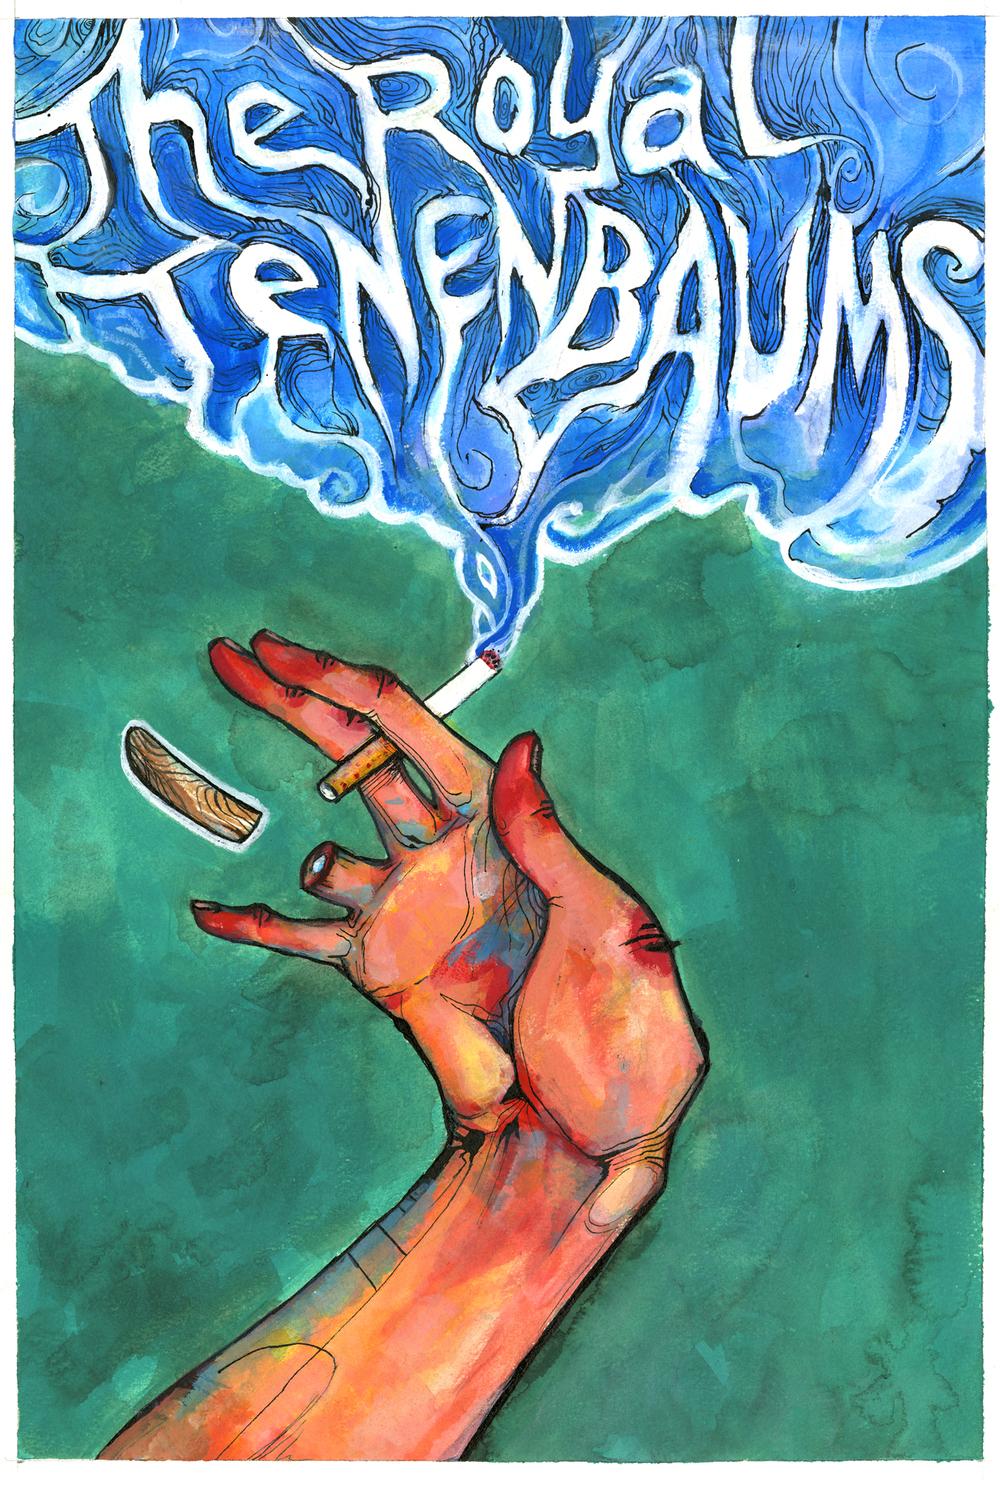 Tenenbaums.jpg